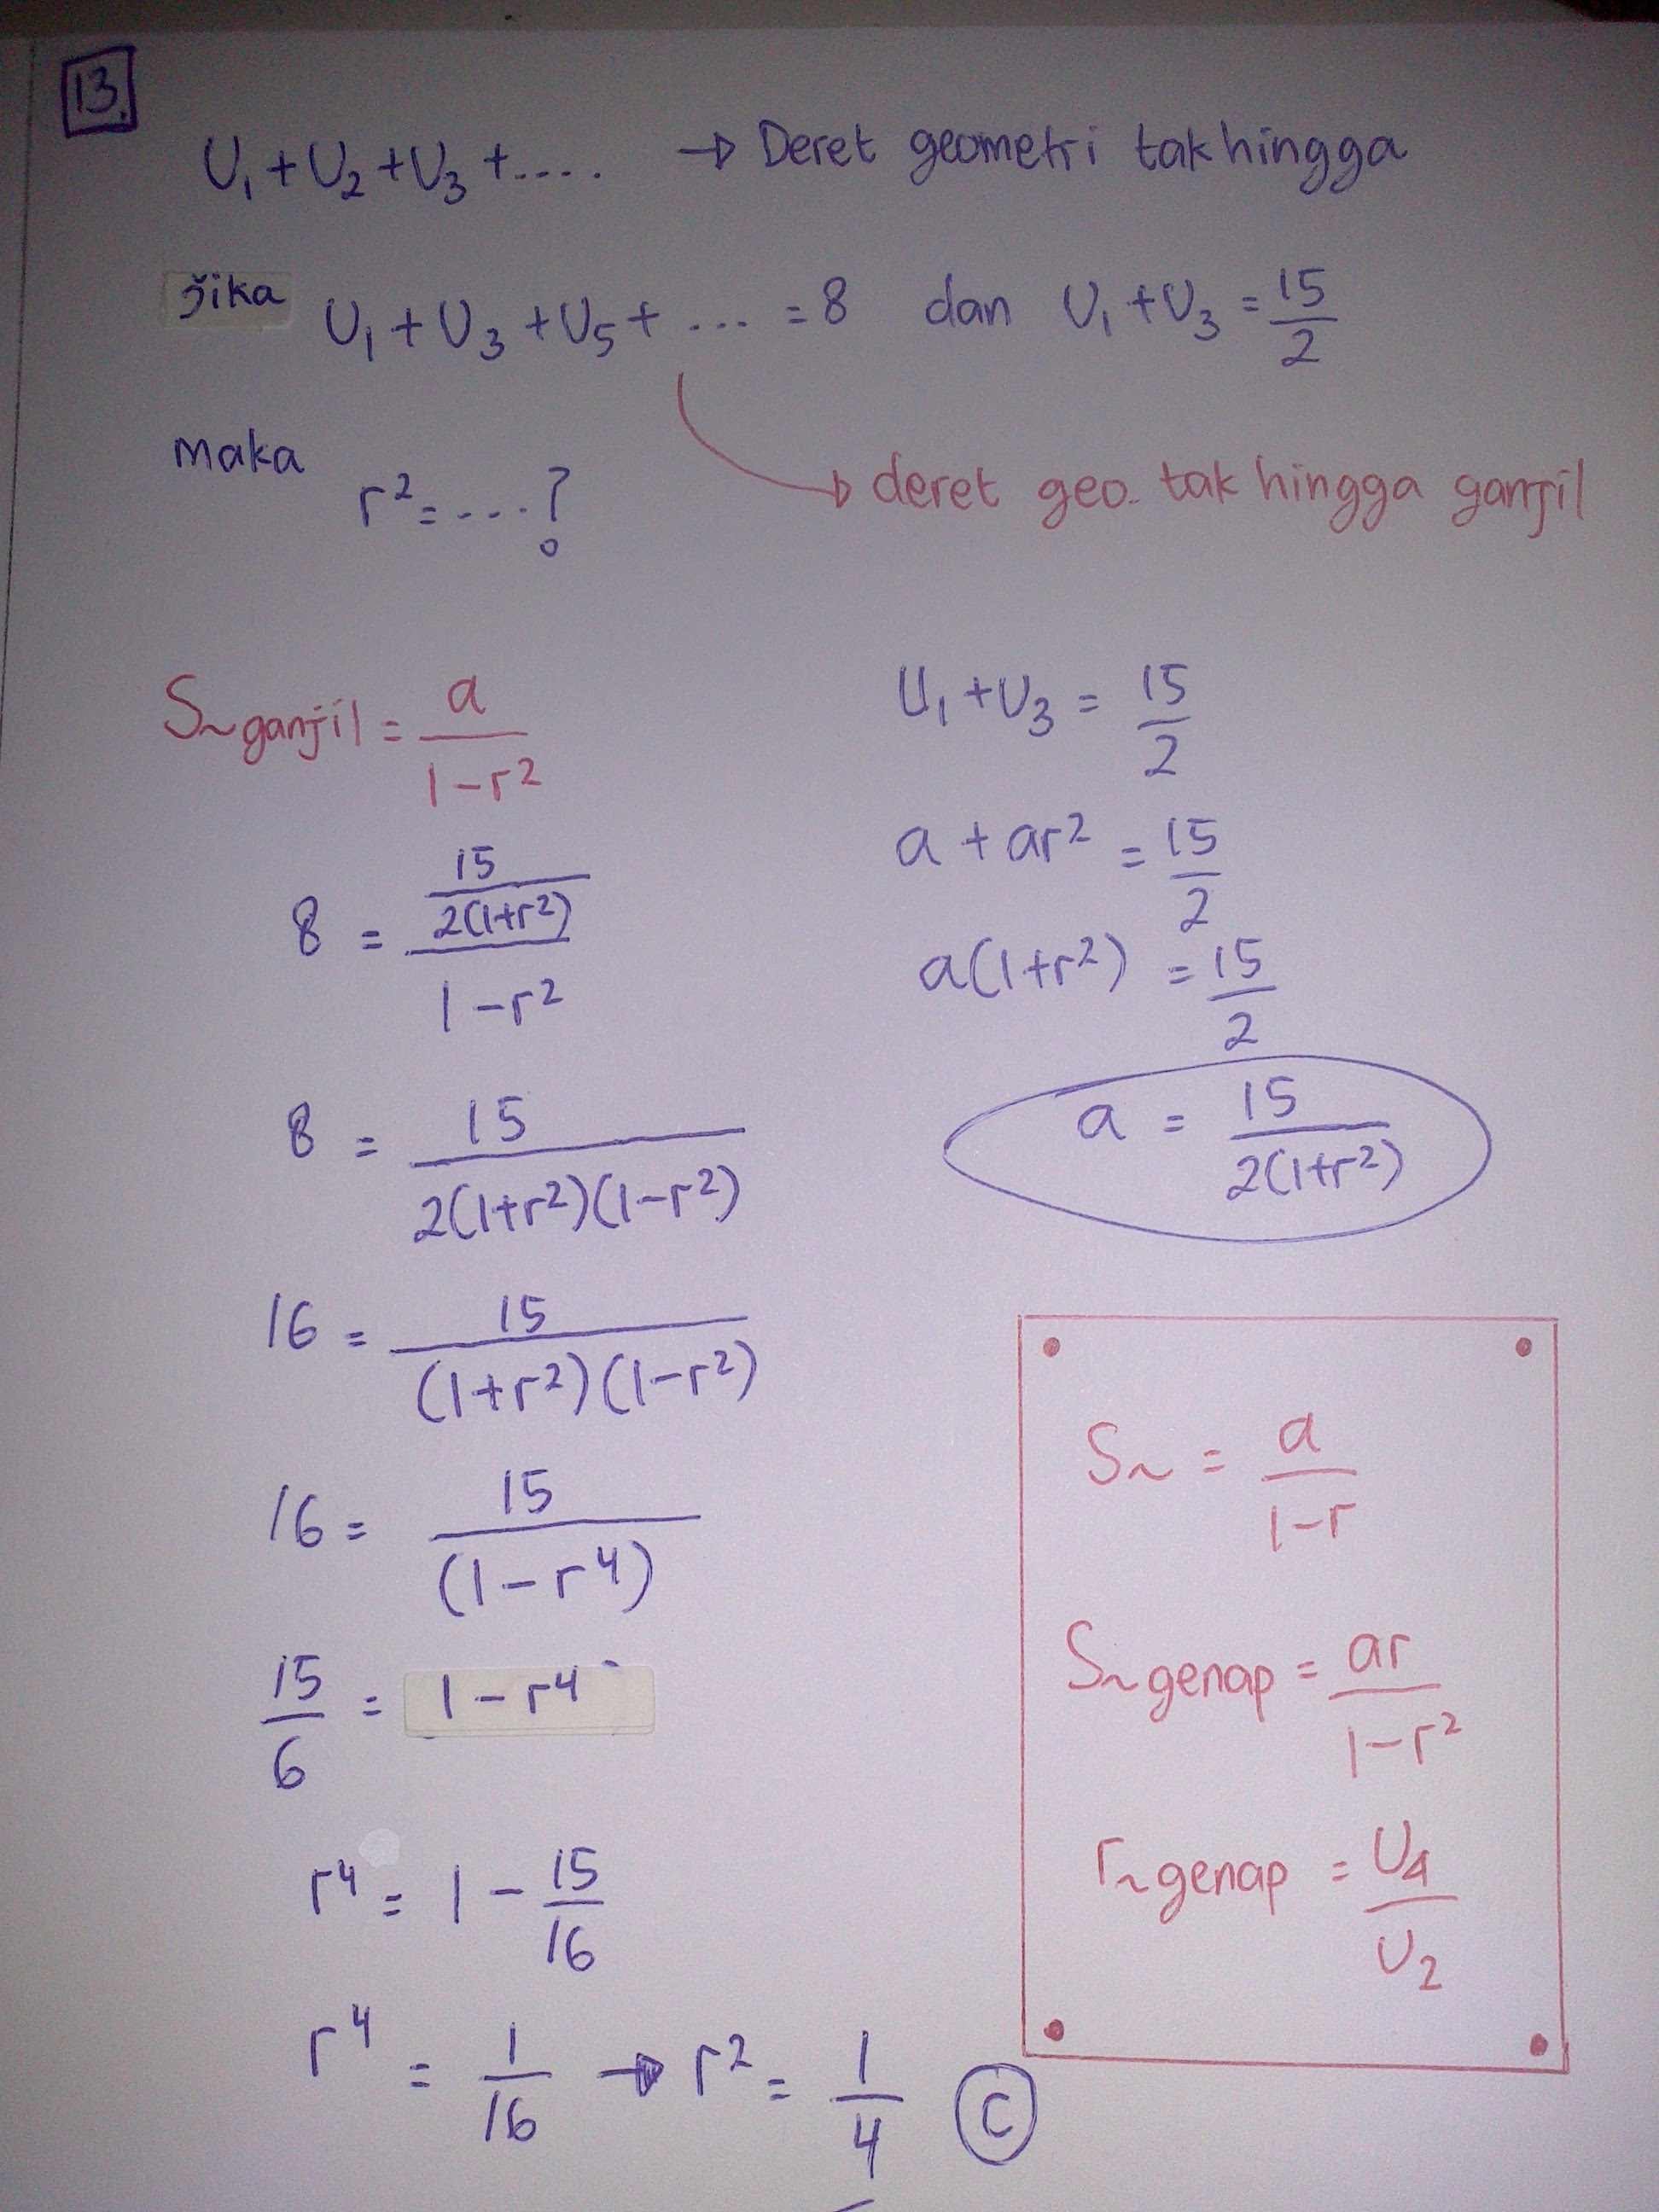 Contoh Soal Sbmptn Matematika Dasar Kumpulan Soal Pelajaran 10